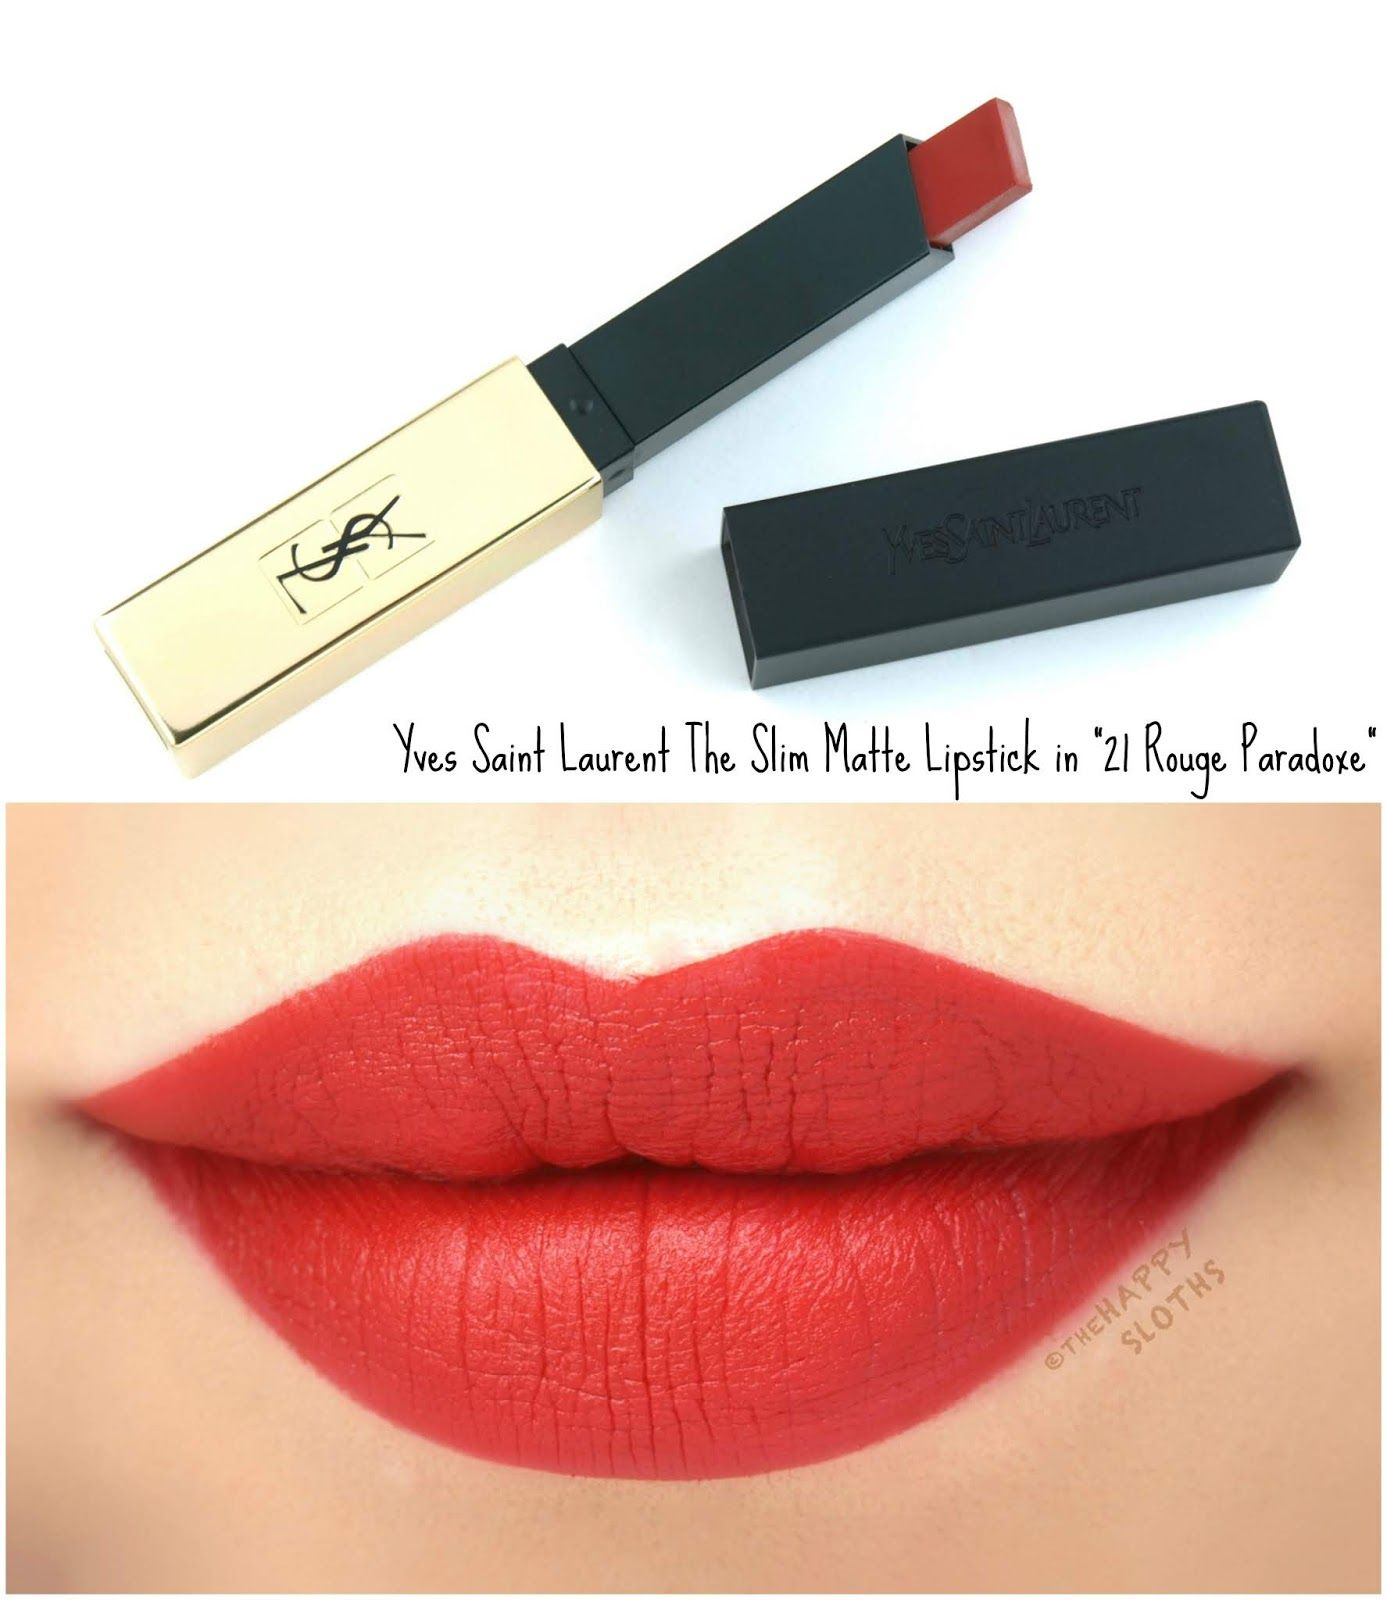 Yves Saint Laurent Lip Colors Lipstick Best Lipsticks